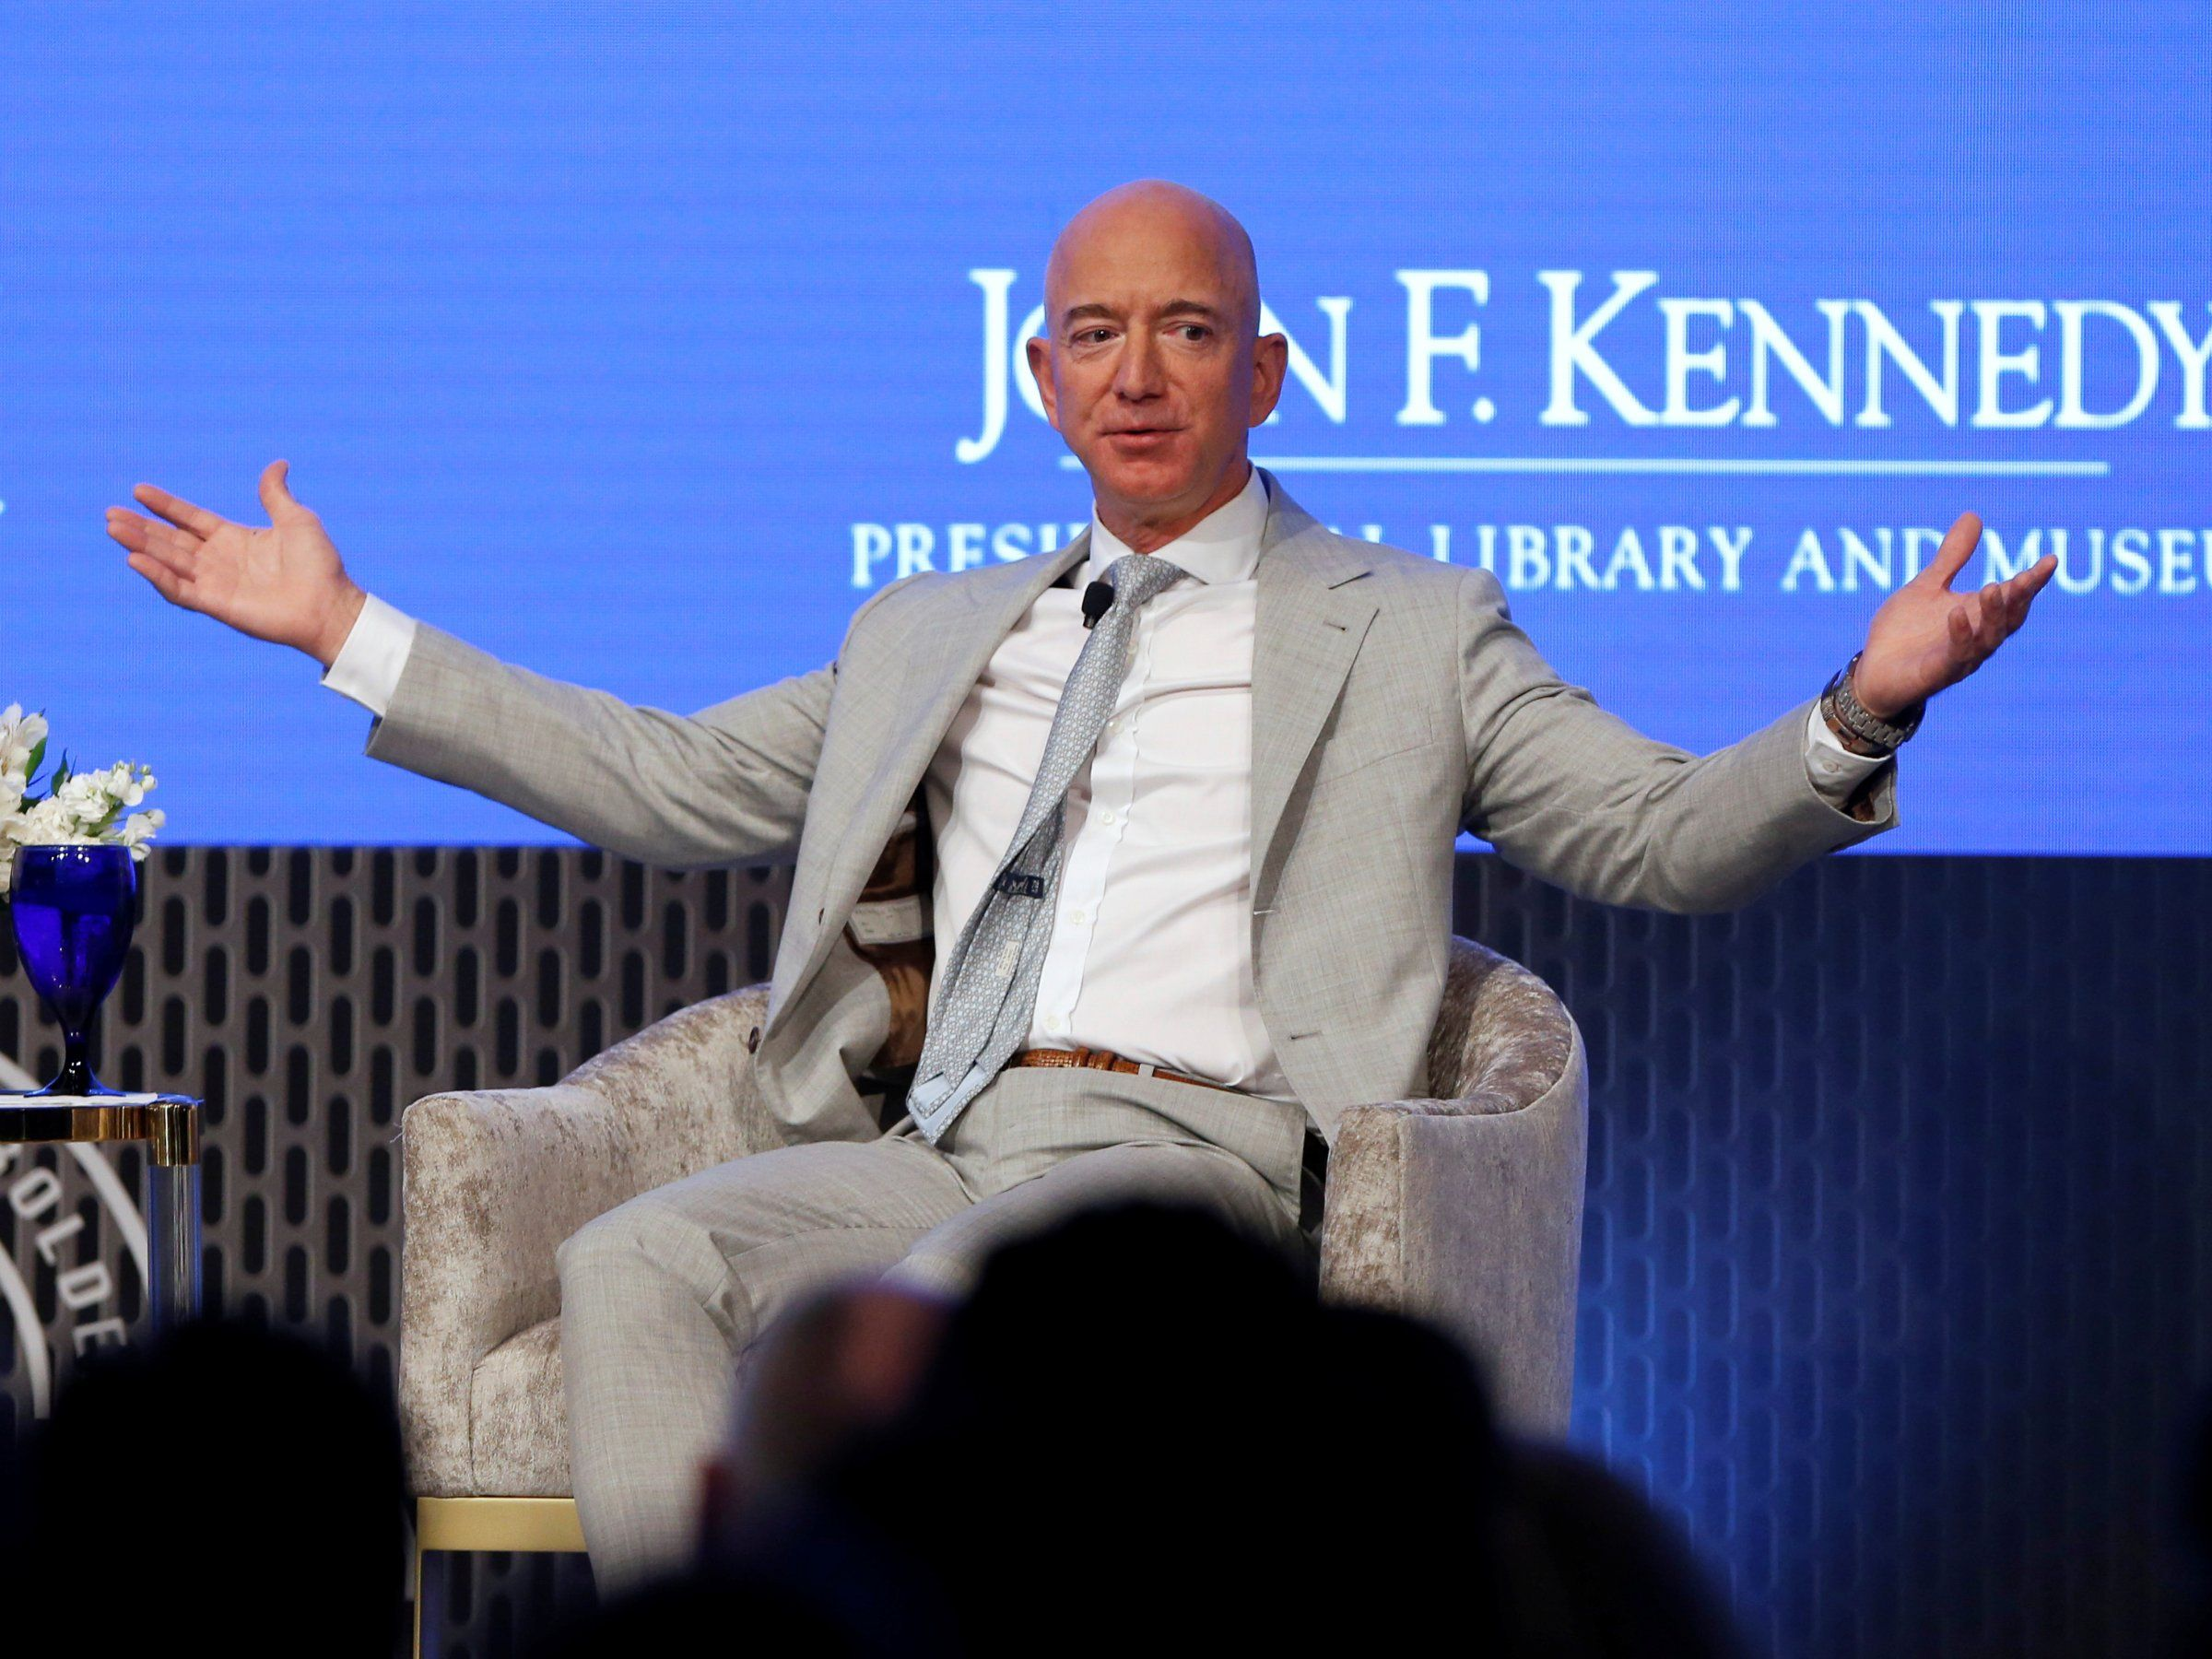 Jeff Bezos just sold 1.8 billion in Amazon stock. Here's